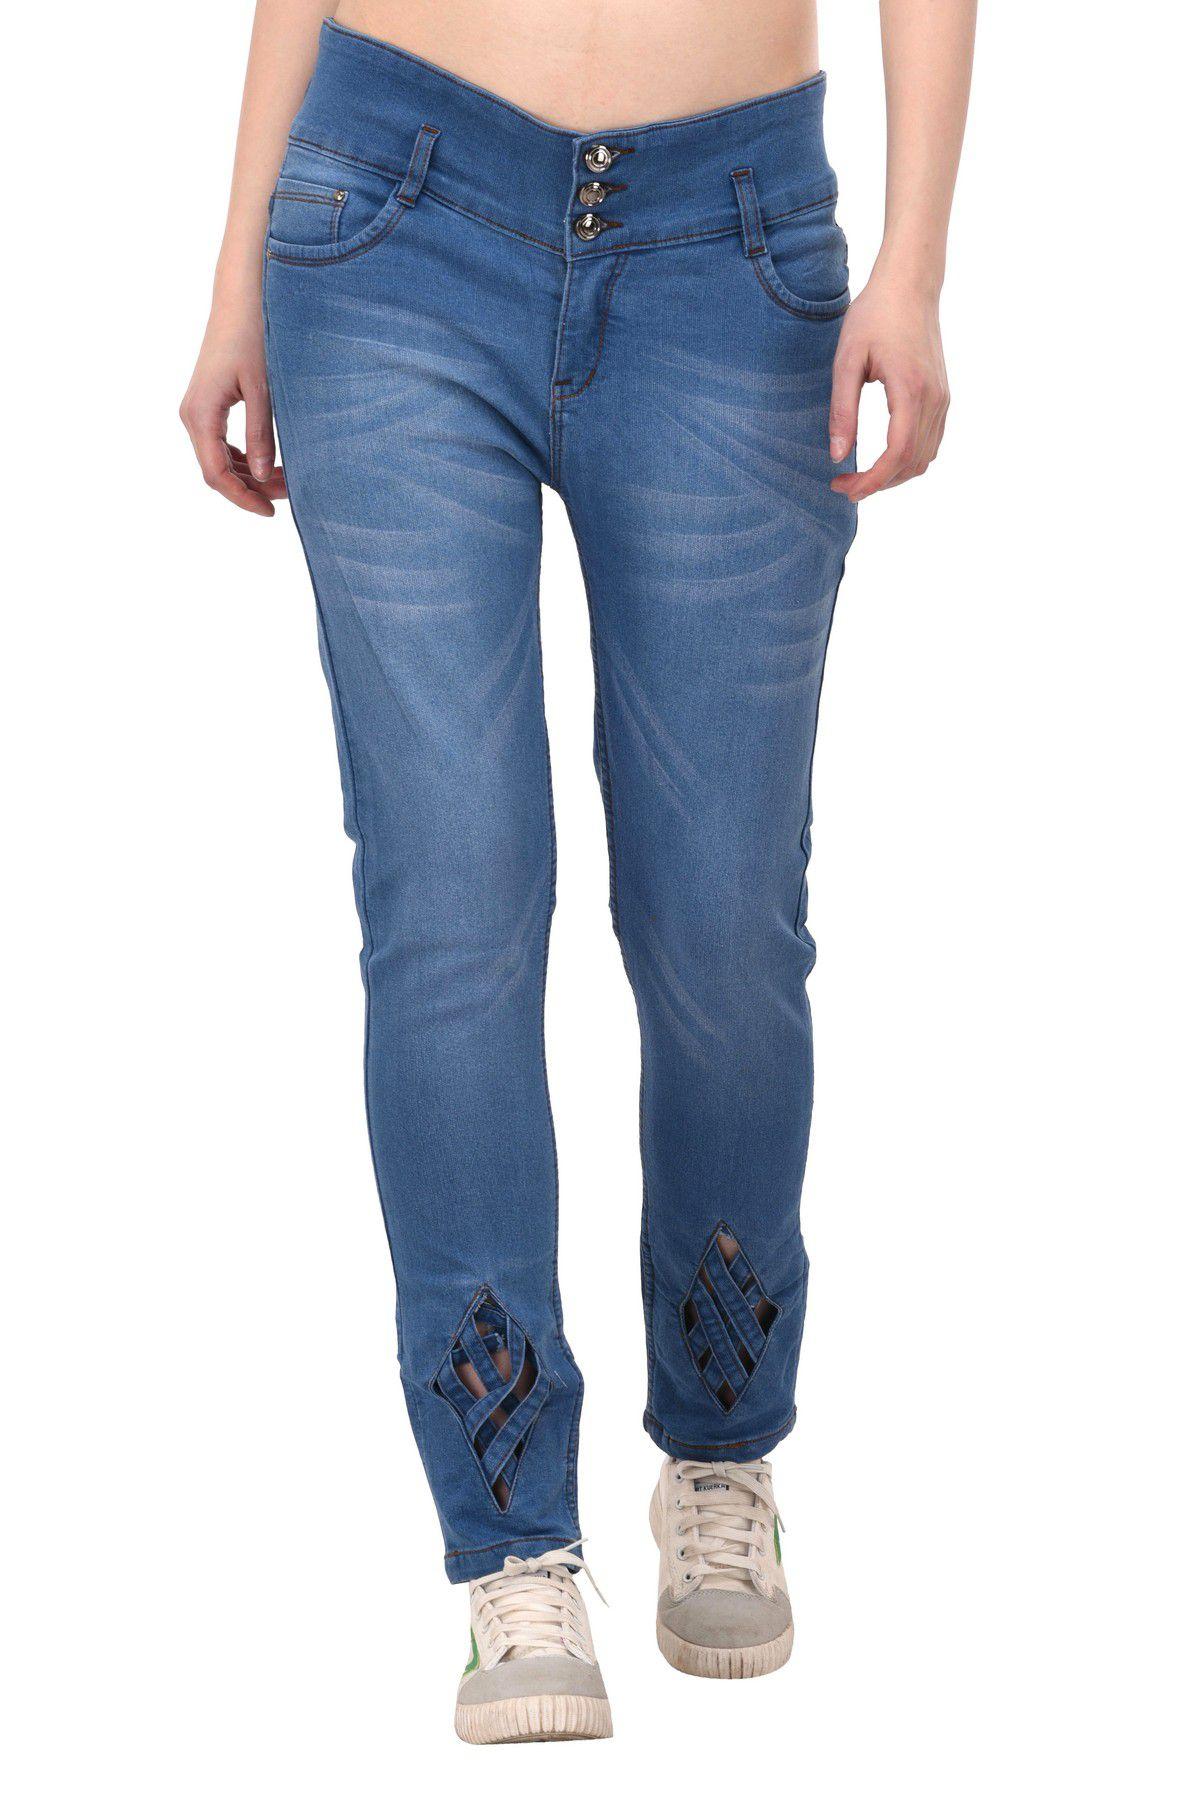 VOXATI Denim Lycra Jeans - Blue